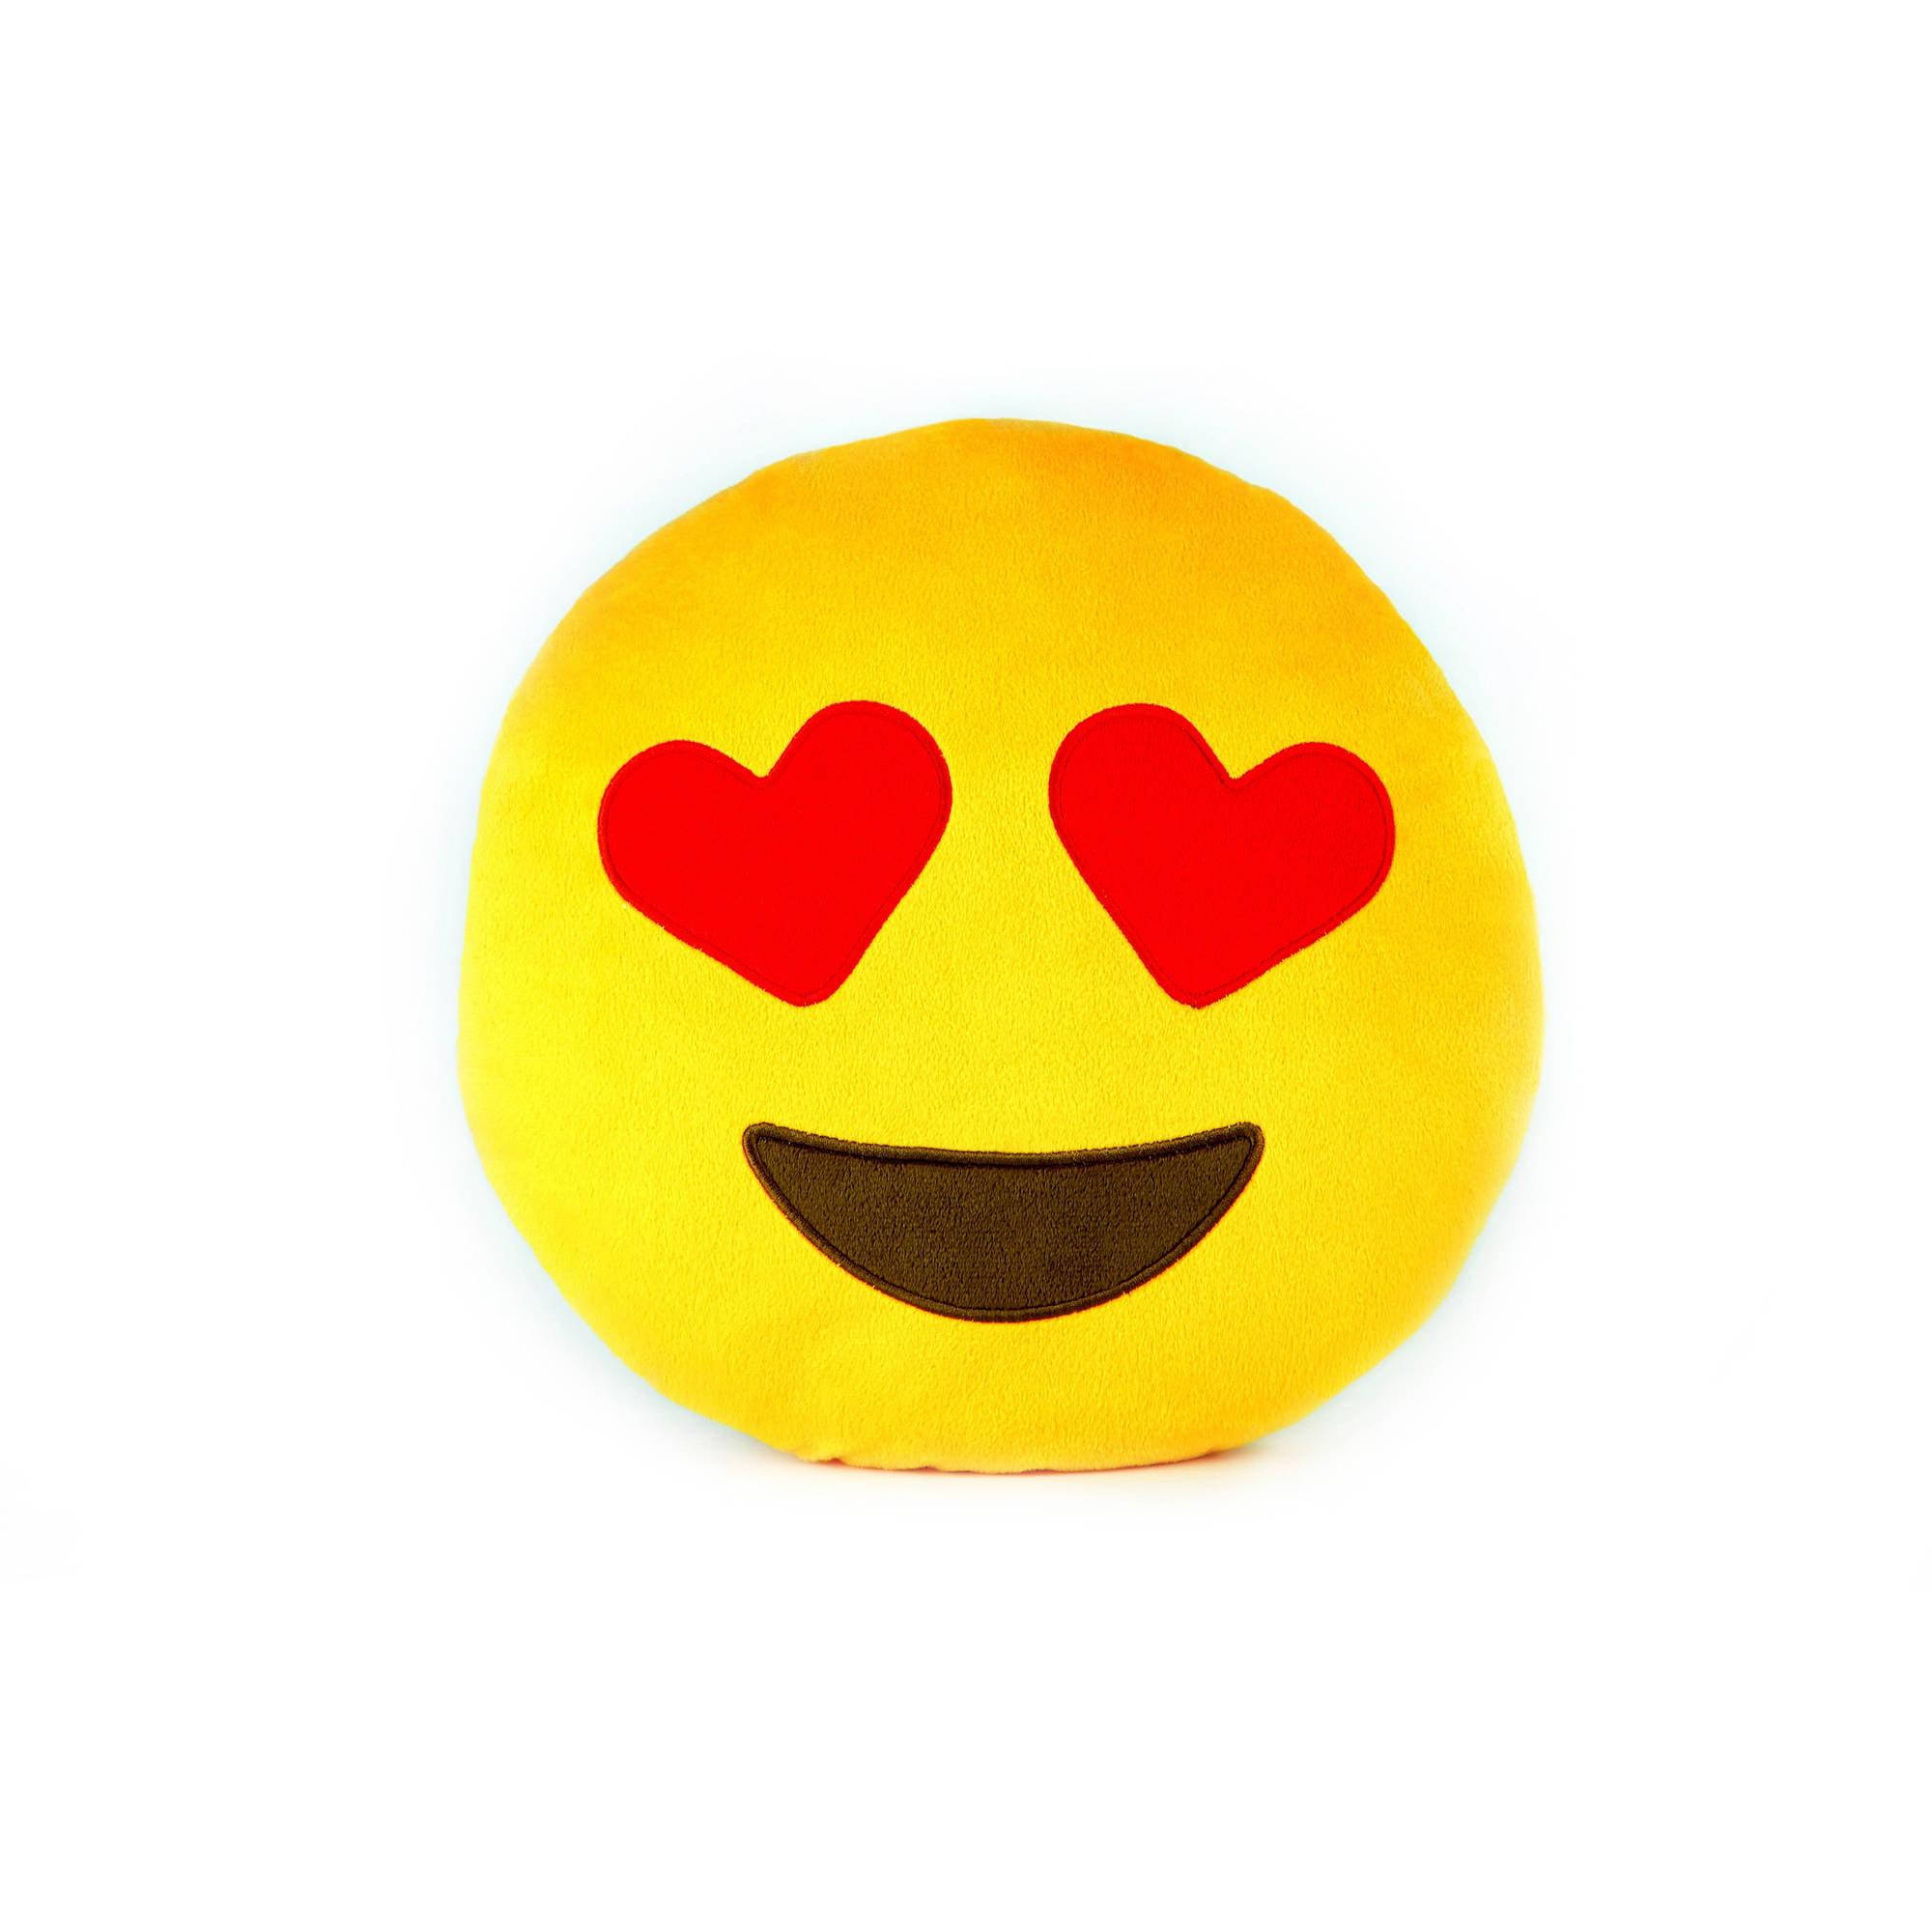 Throwboy The Original Emoji Pillows - Hearts